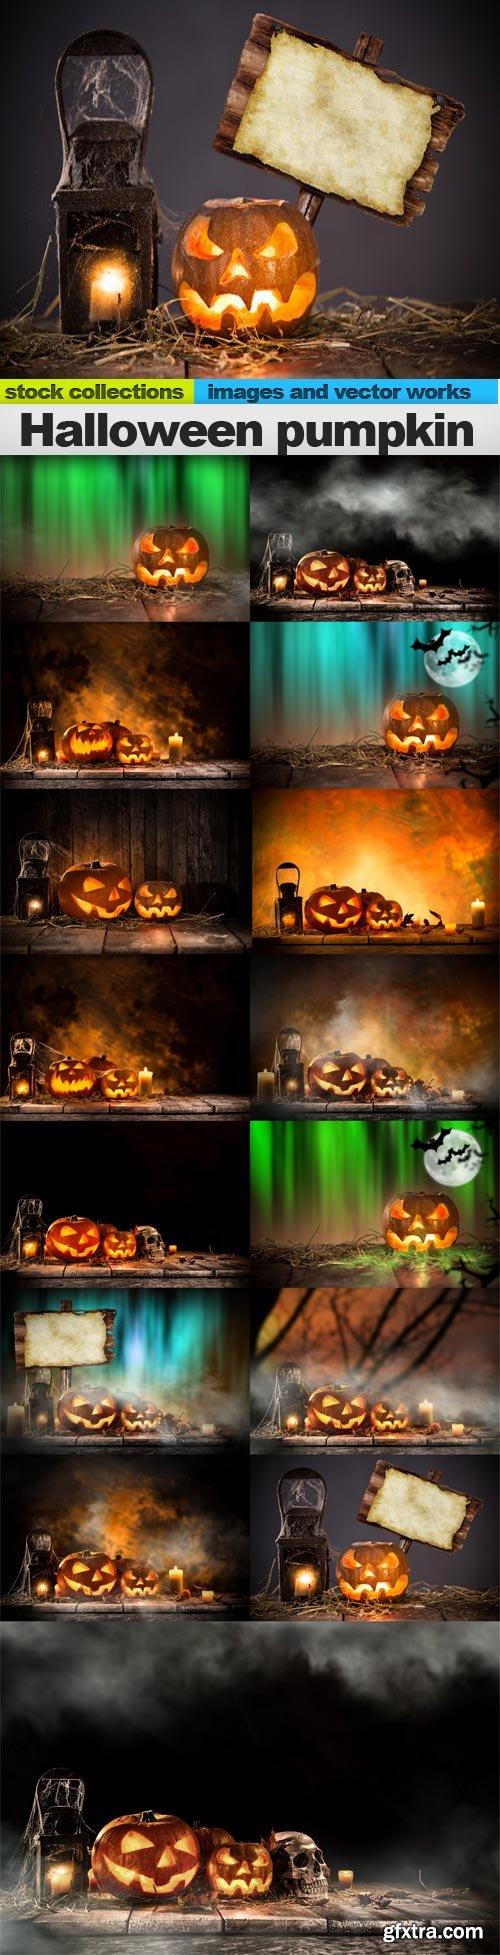 Halloween pumpkin, 15 x UHQ JPEG